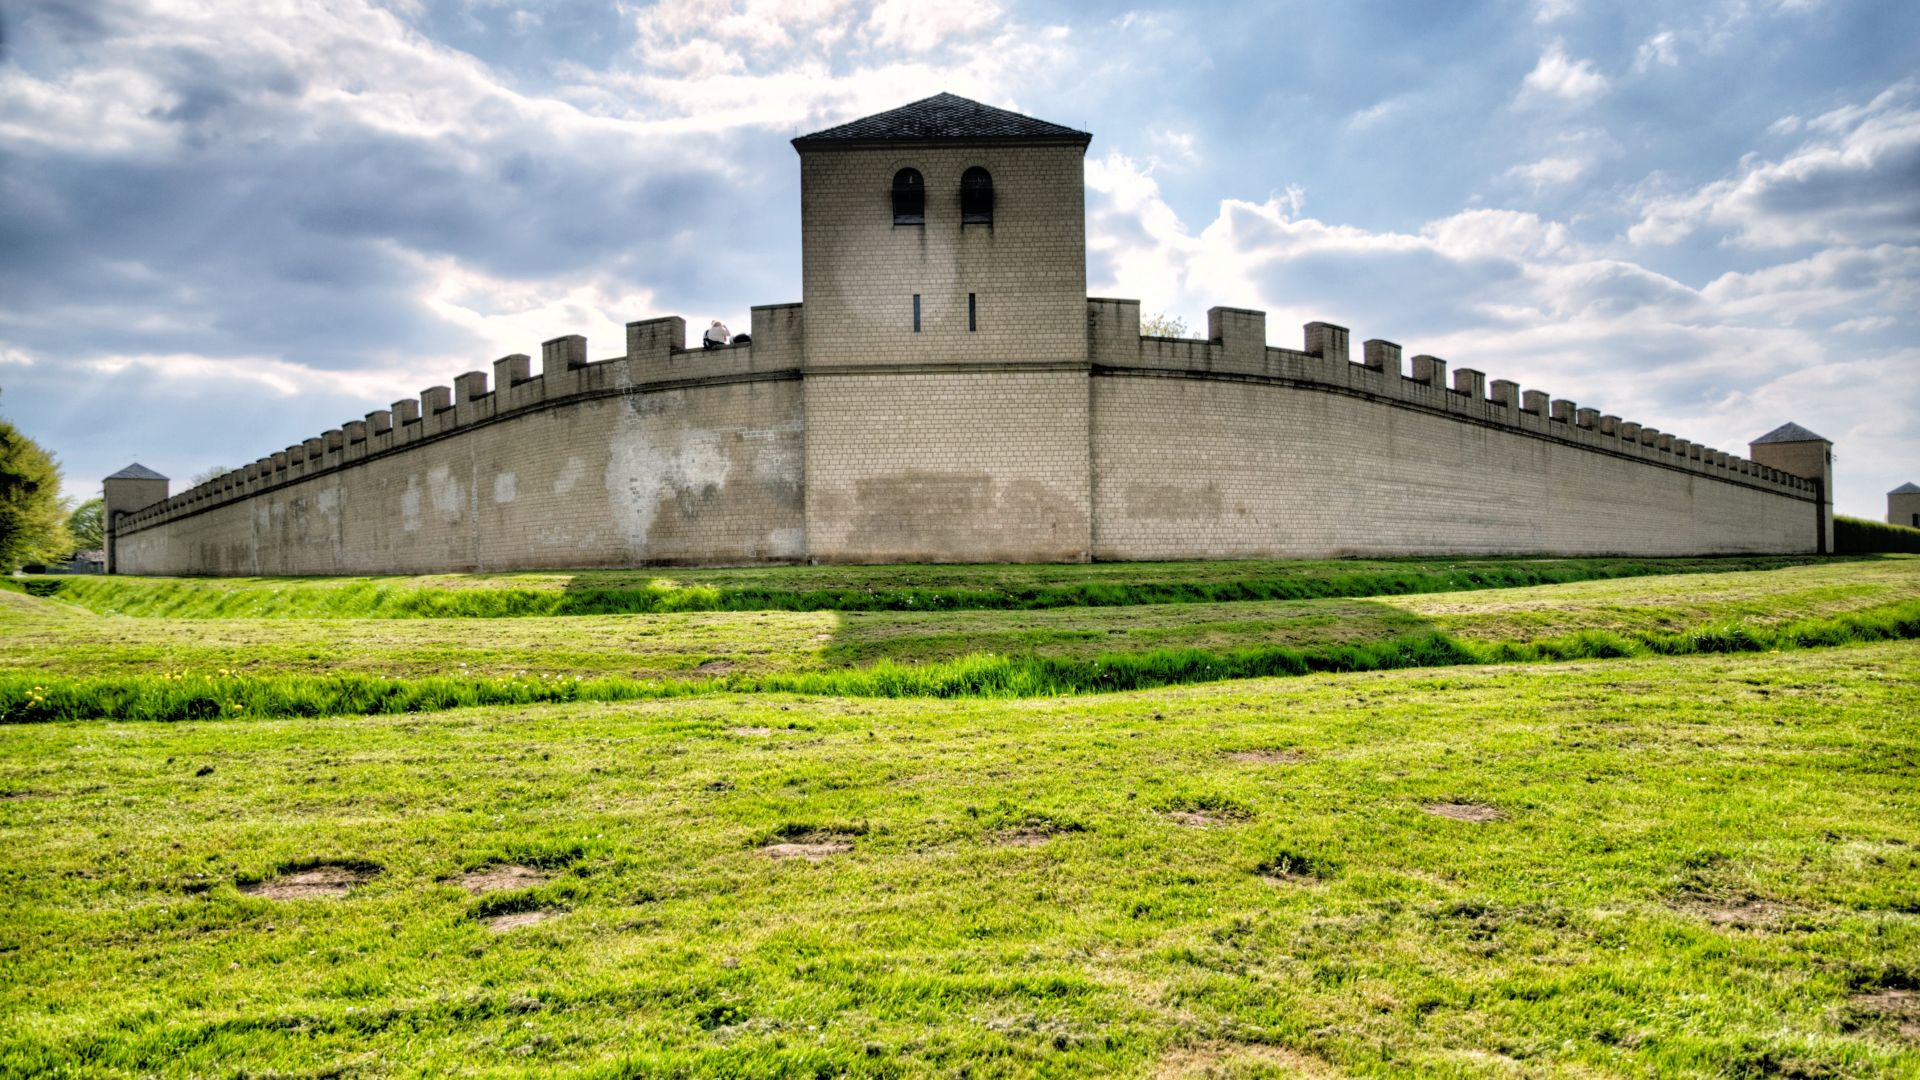 Xanten: Roman Wall in the Archaeological Park in Xanten